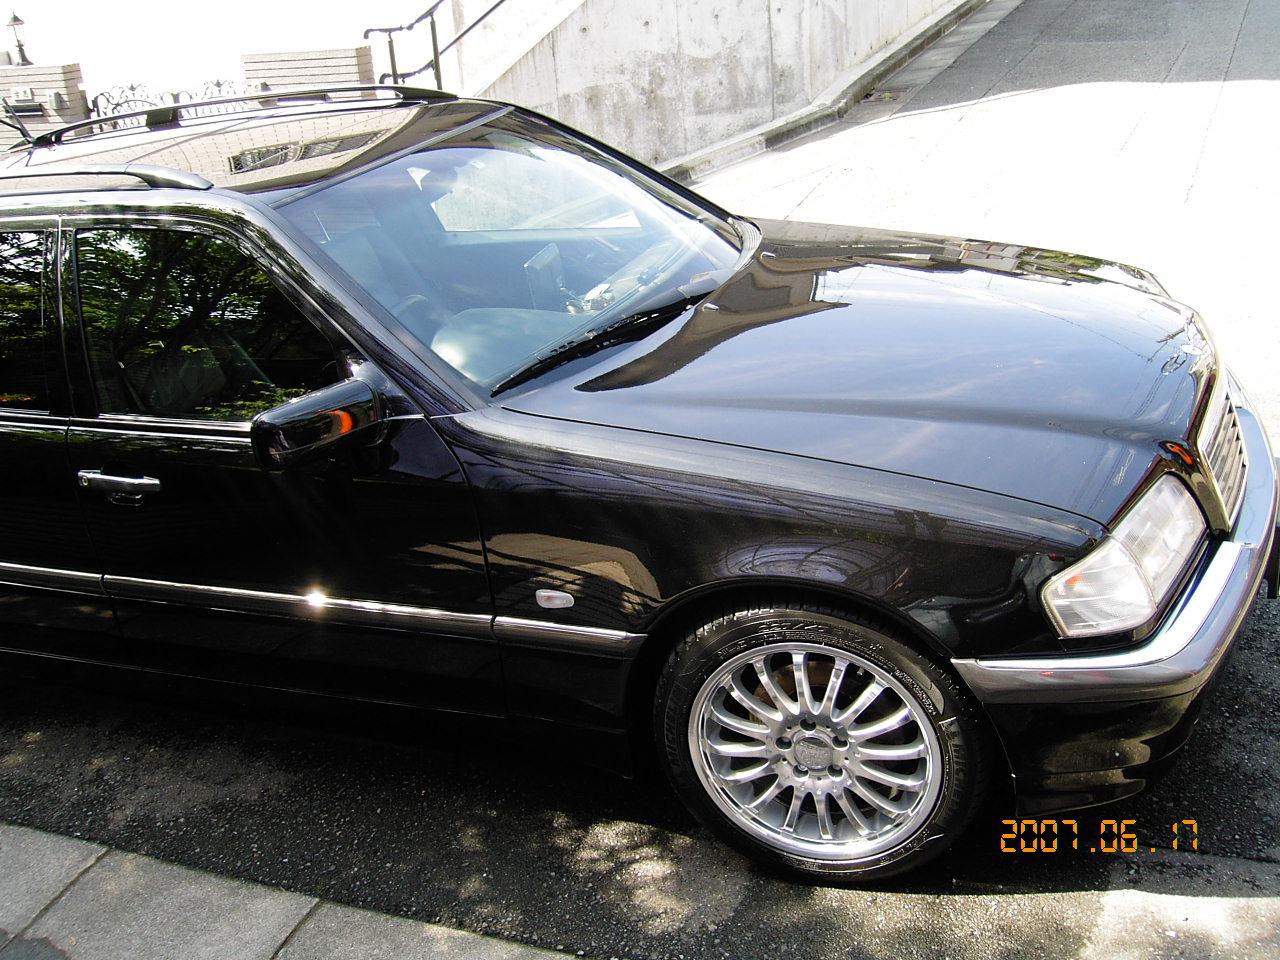 Kicx6030